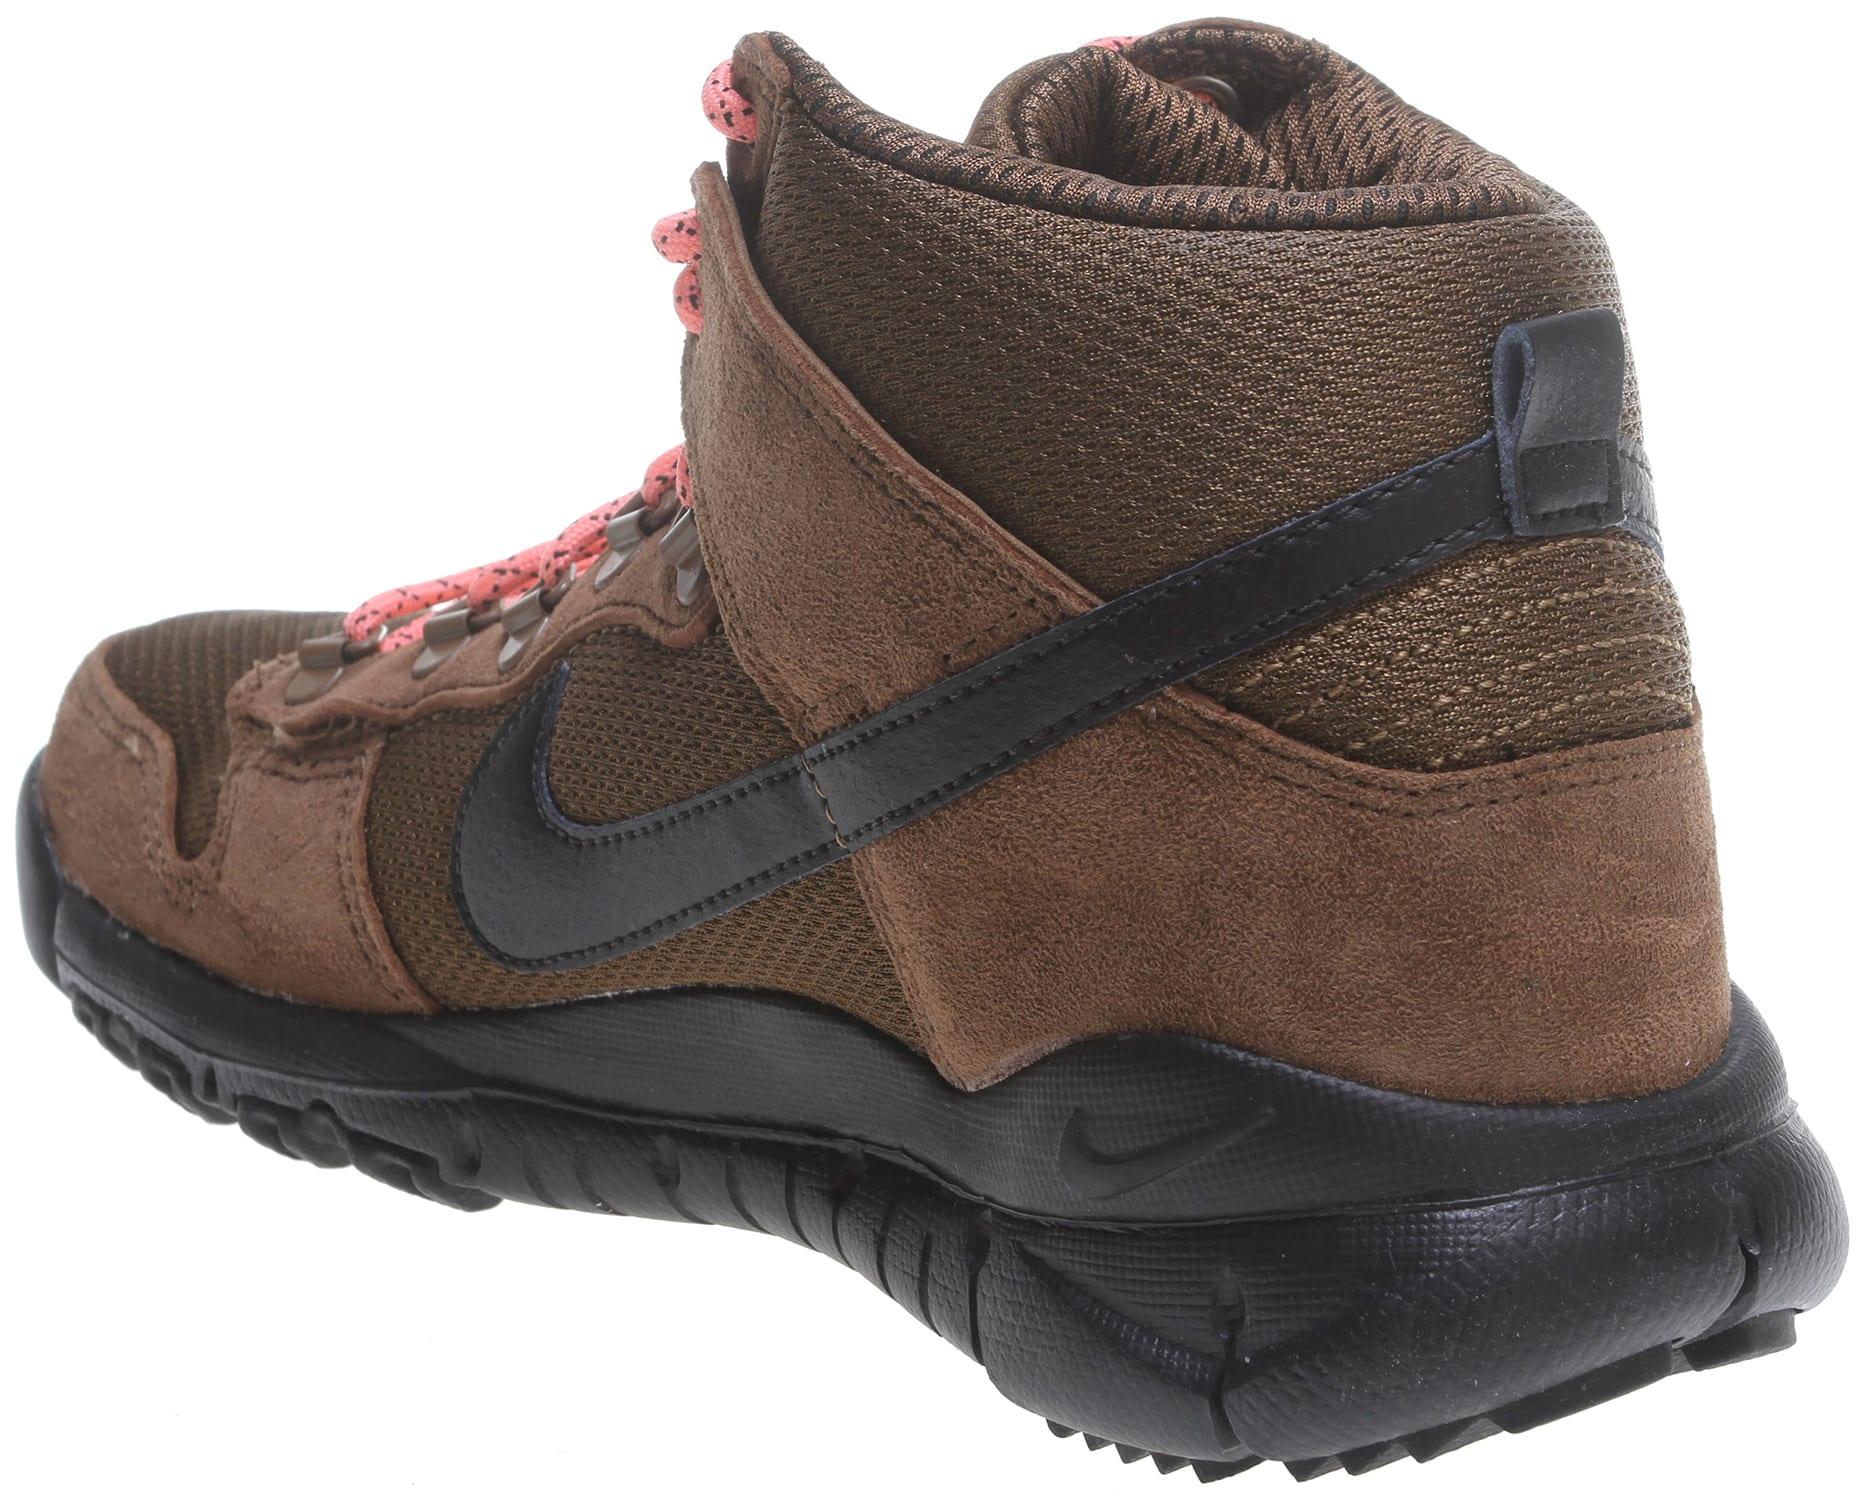 1222422c87fc8 Nike SB Dunk High Hiking Boots - thumbnail 3